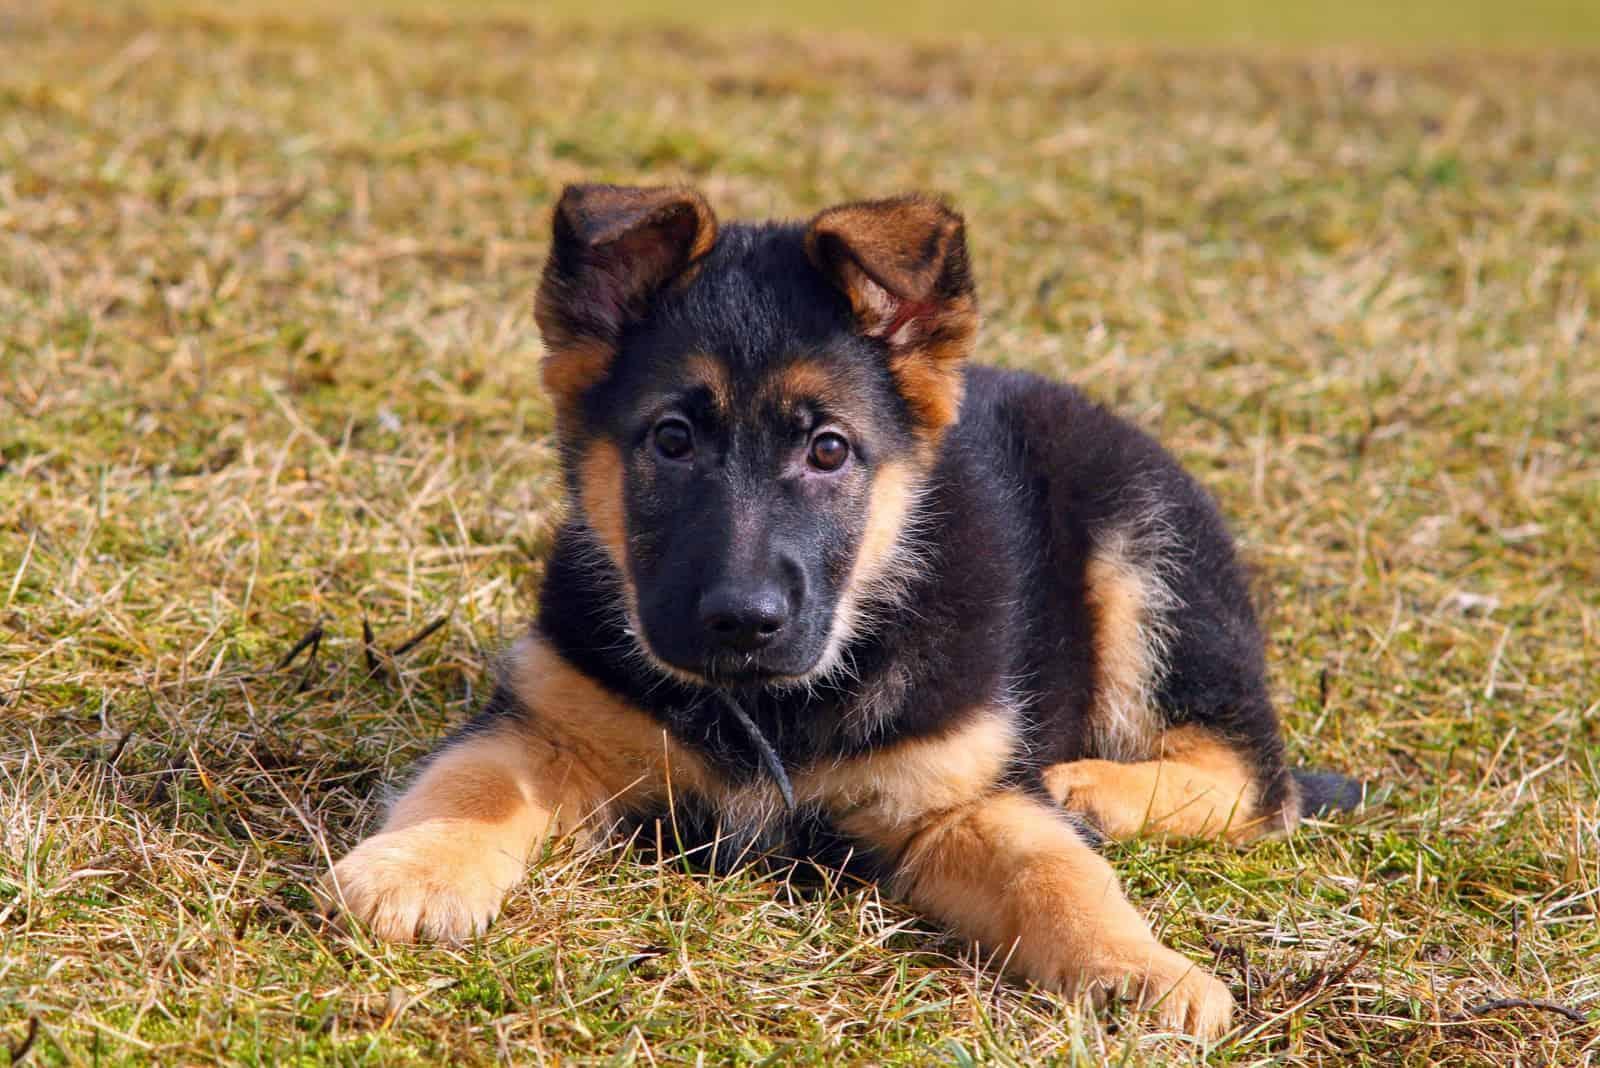 german shepherd puppy lying on the grass